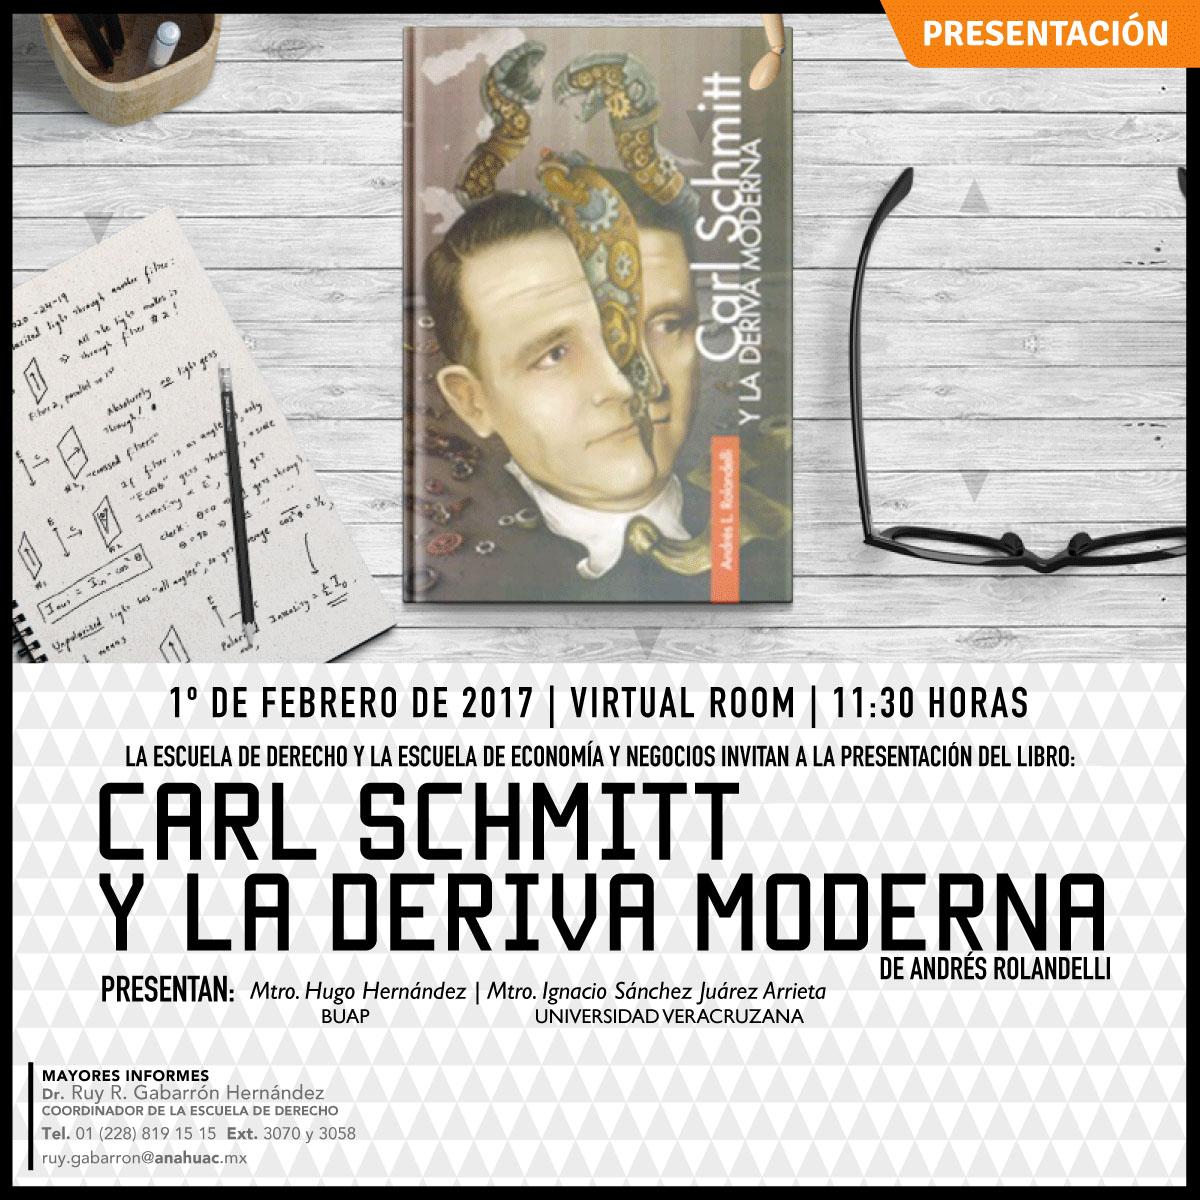 Carl Schmitt y la Deriva Moderna